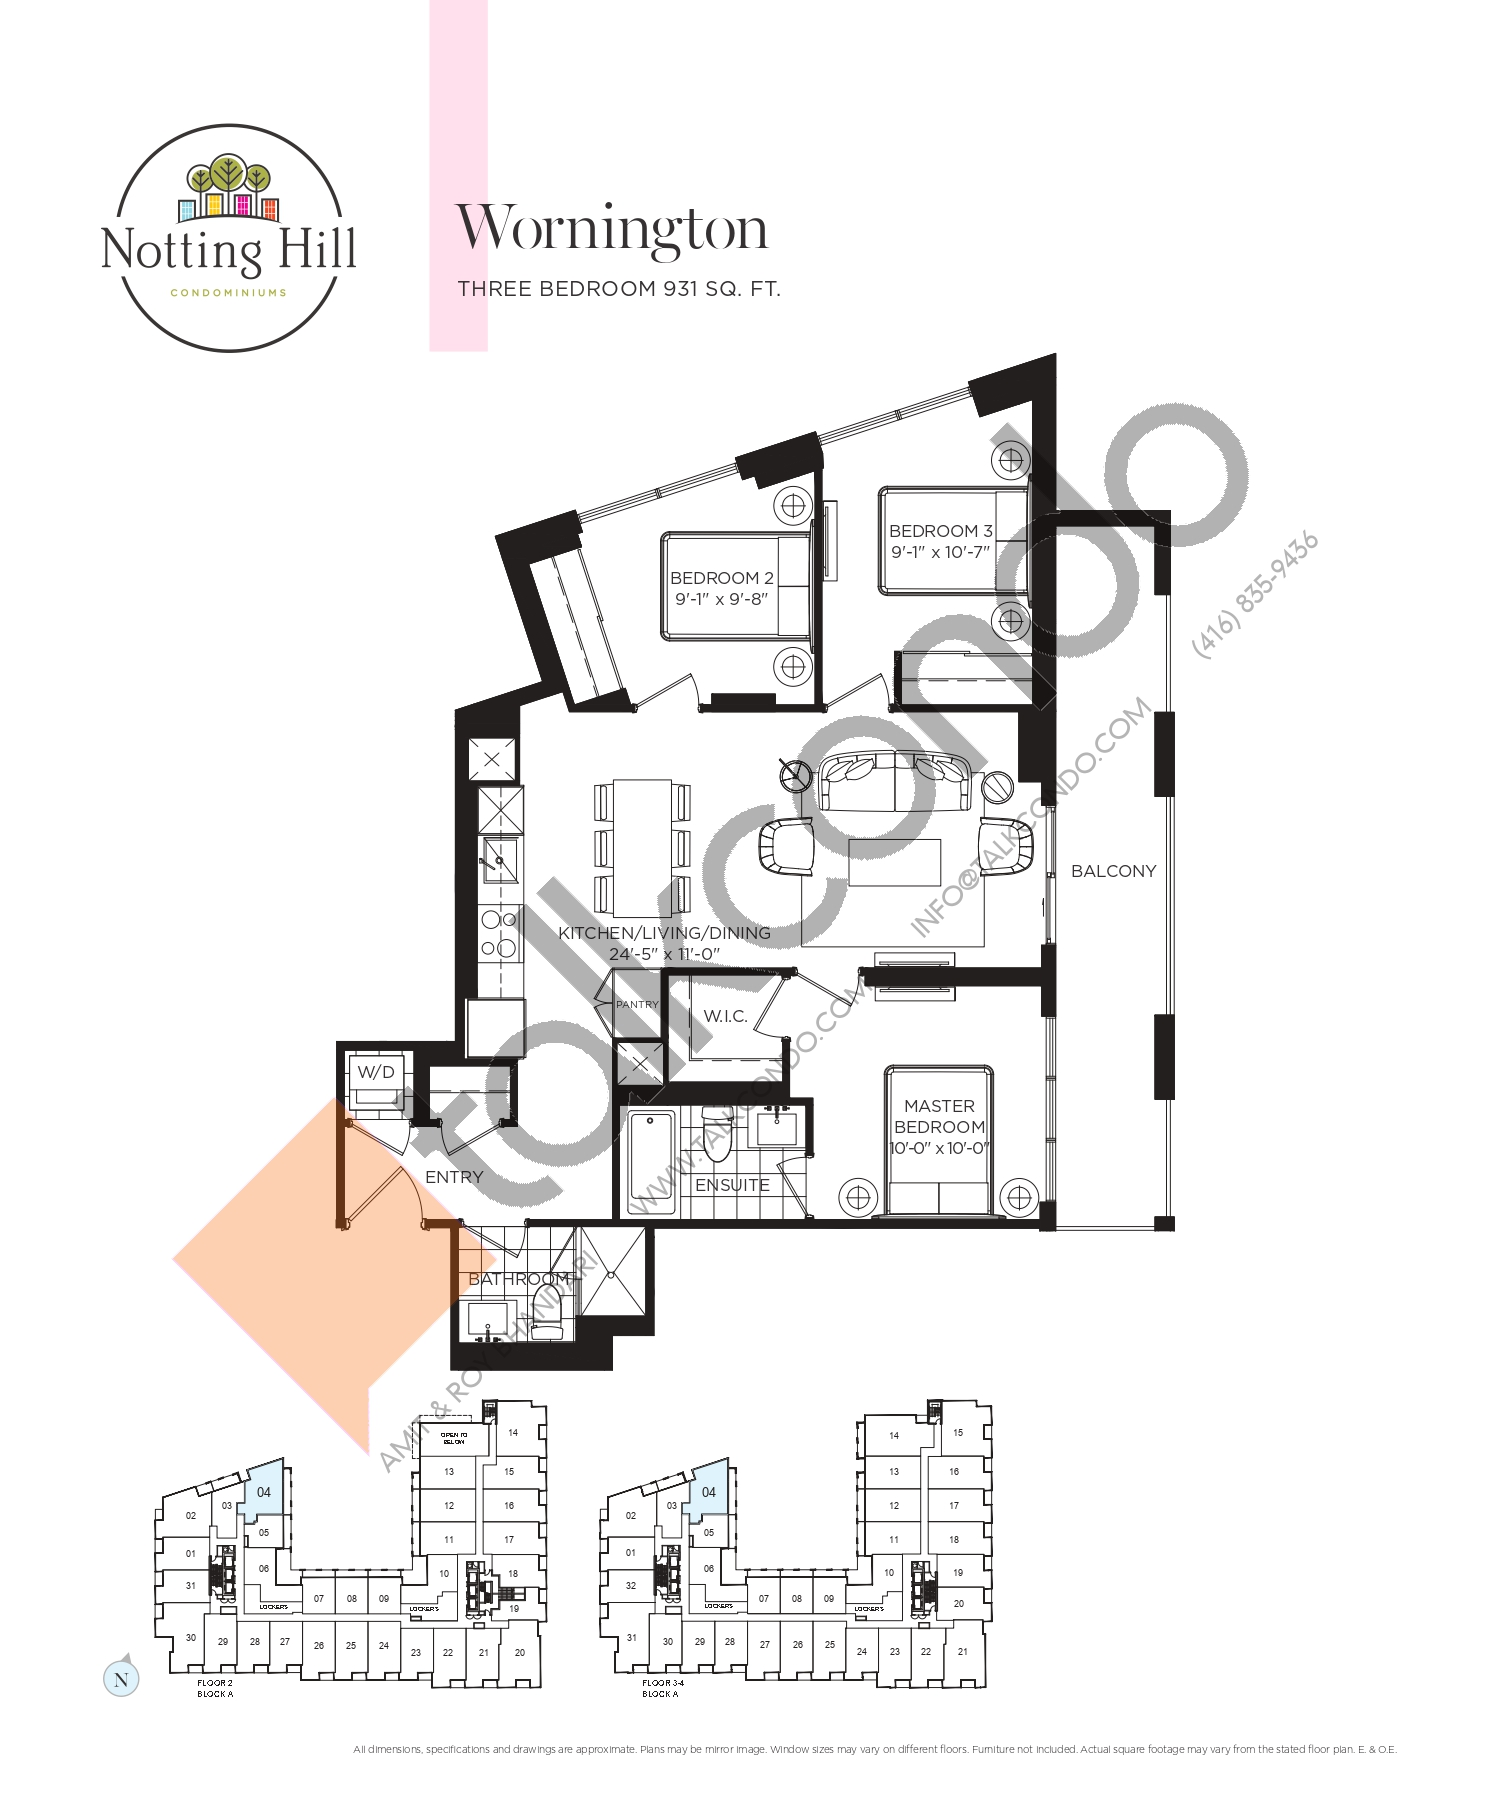 Wornington Floor Plan at Notting Hill Phase 2 Condos - 931 sq.ft